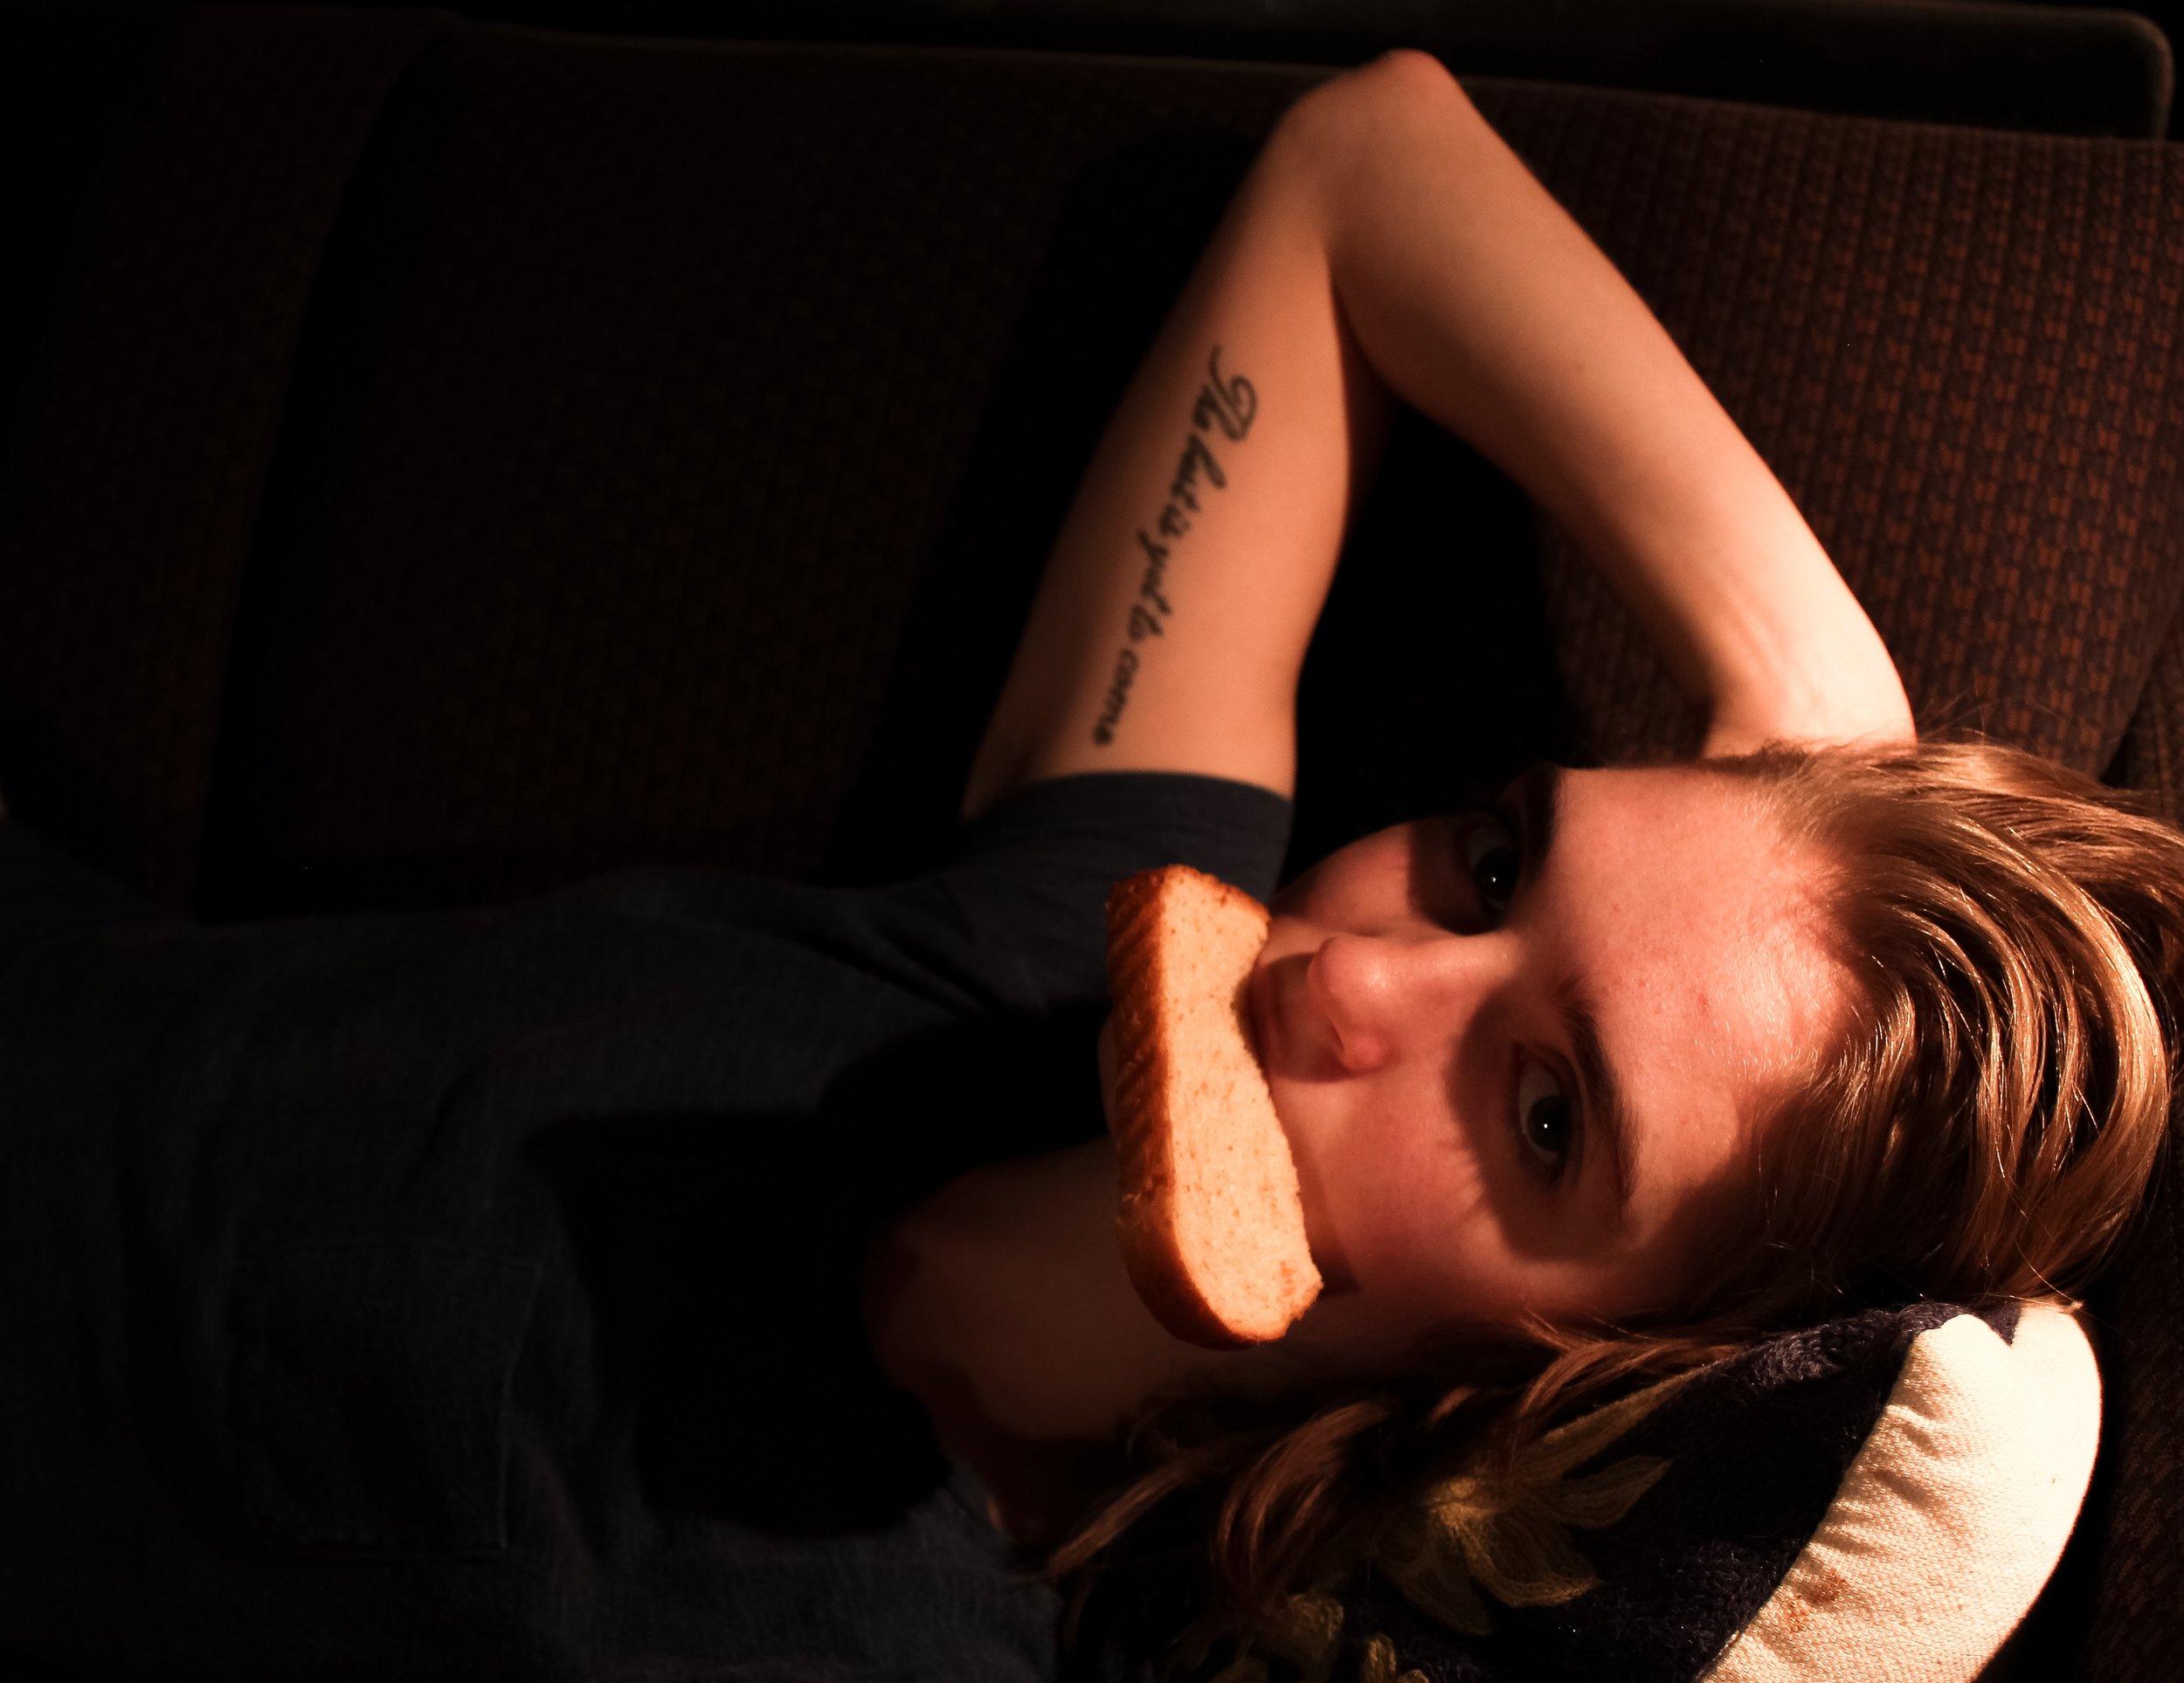 Doran's first Bread photo circa December 2016